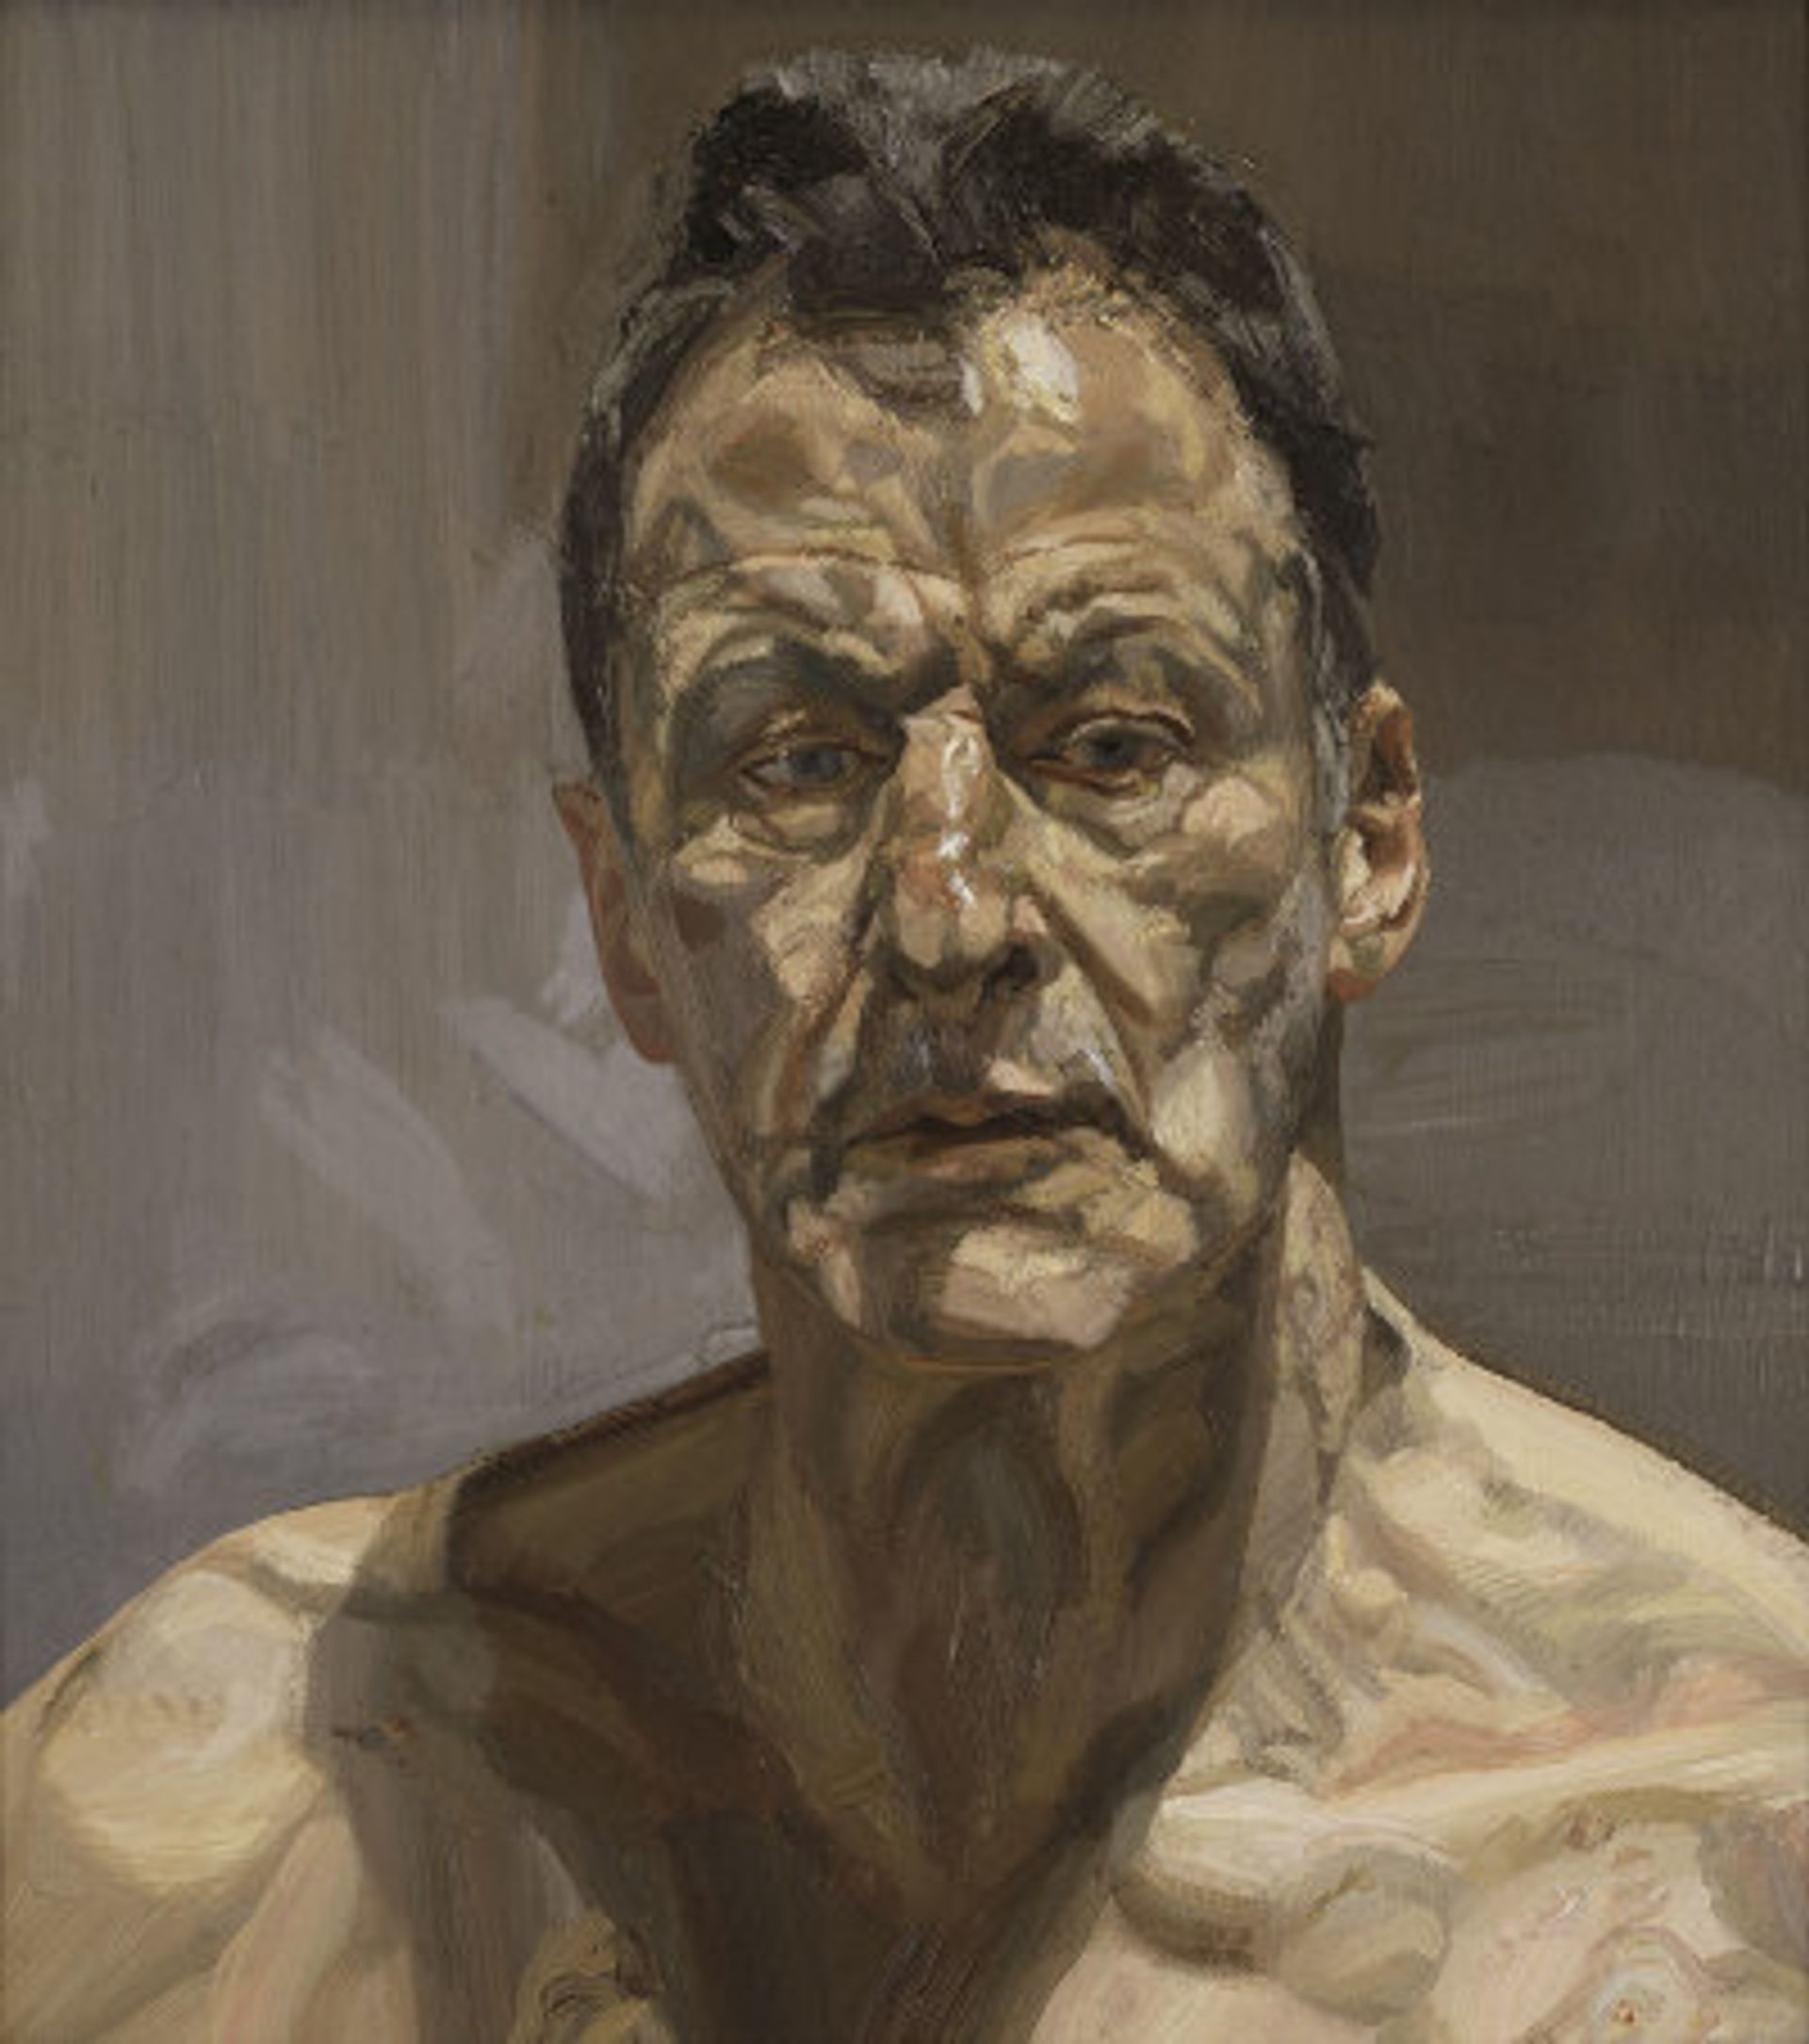 Reflection (self-portrait), 1985, by Lucian Freud © The Lucian Freud Archive / Bridgeman Images